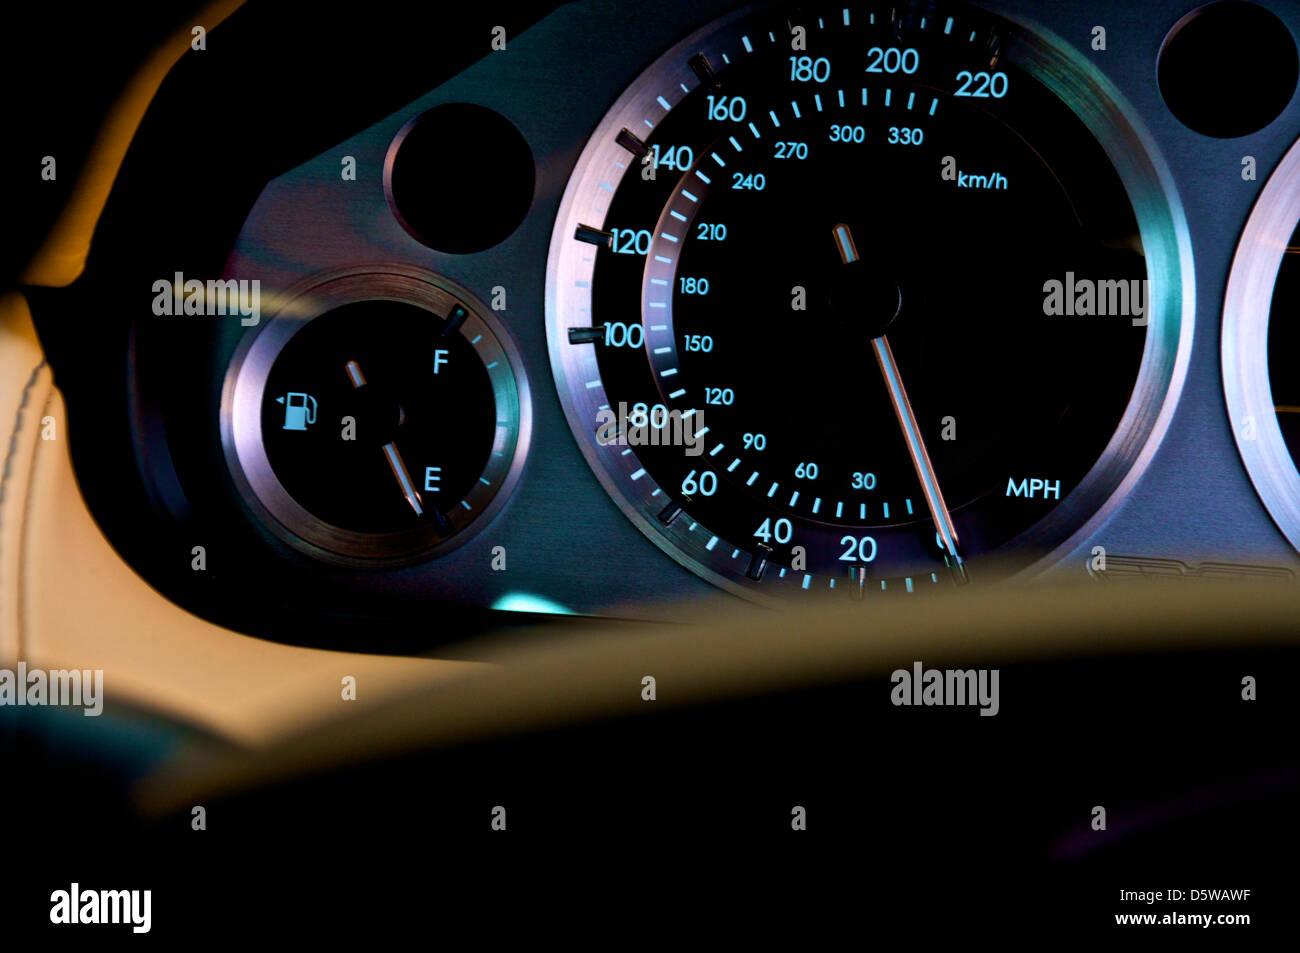 aston martin dash board showing the speedometer - Stock Image